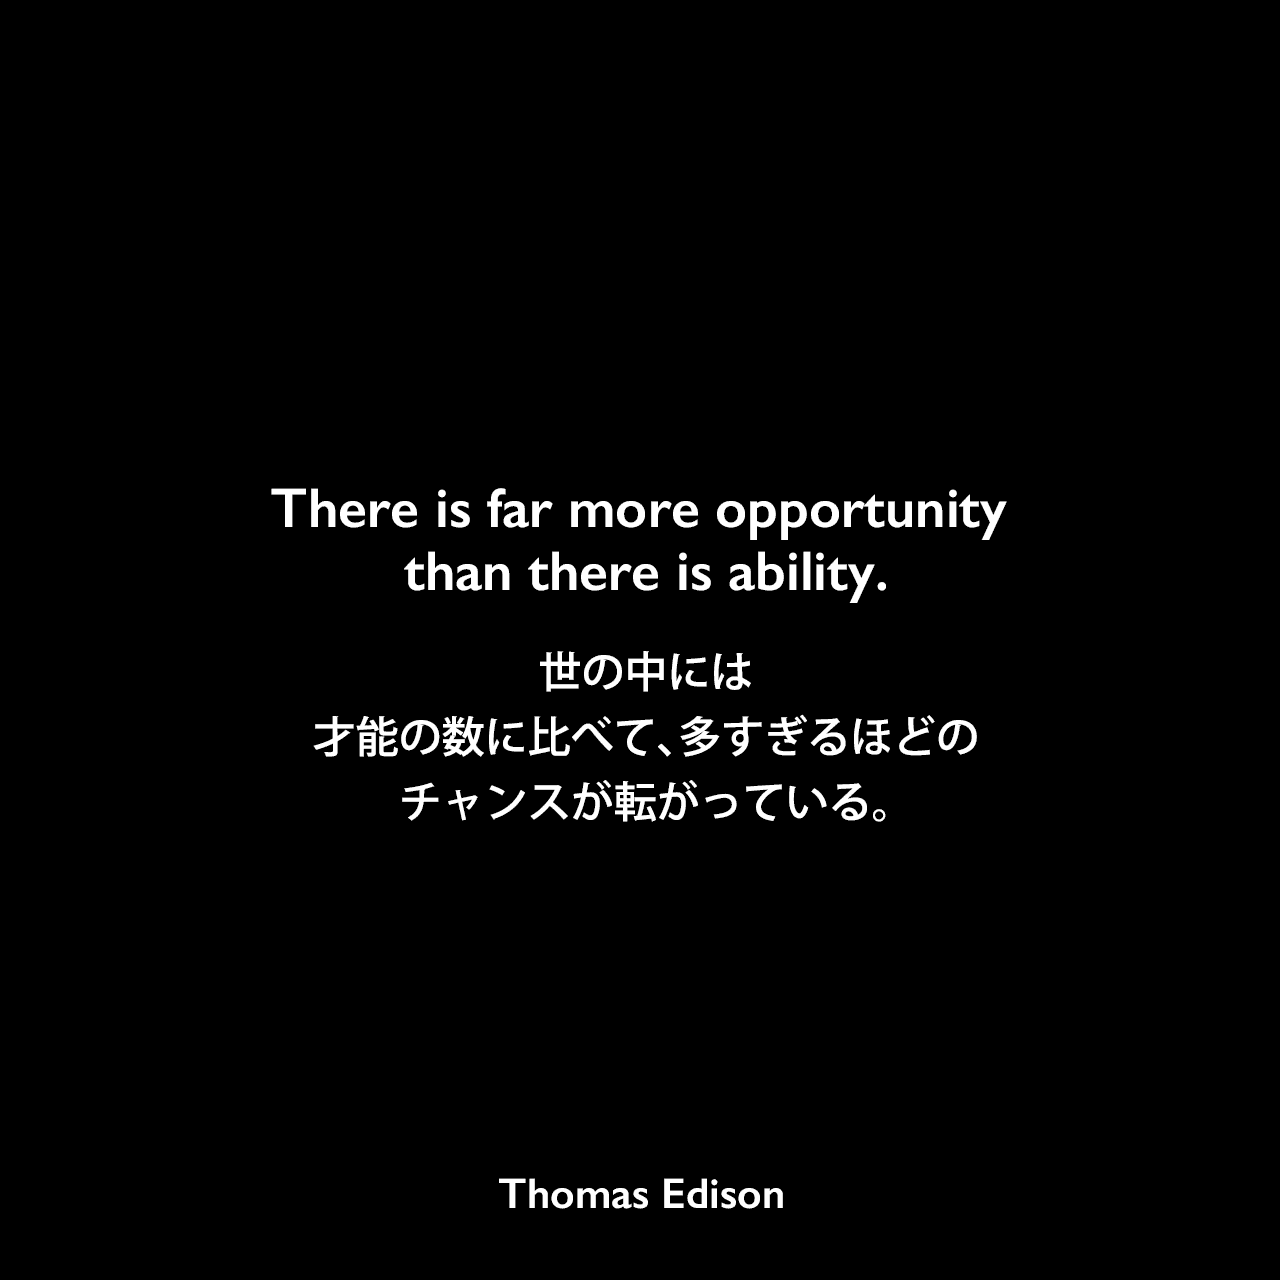 There is far more opportunity than there is ability.世の中には才能の数に比べて、多すぎるほどのチャンスが転がっている。Thomas Edison